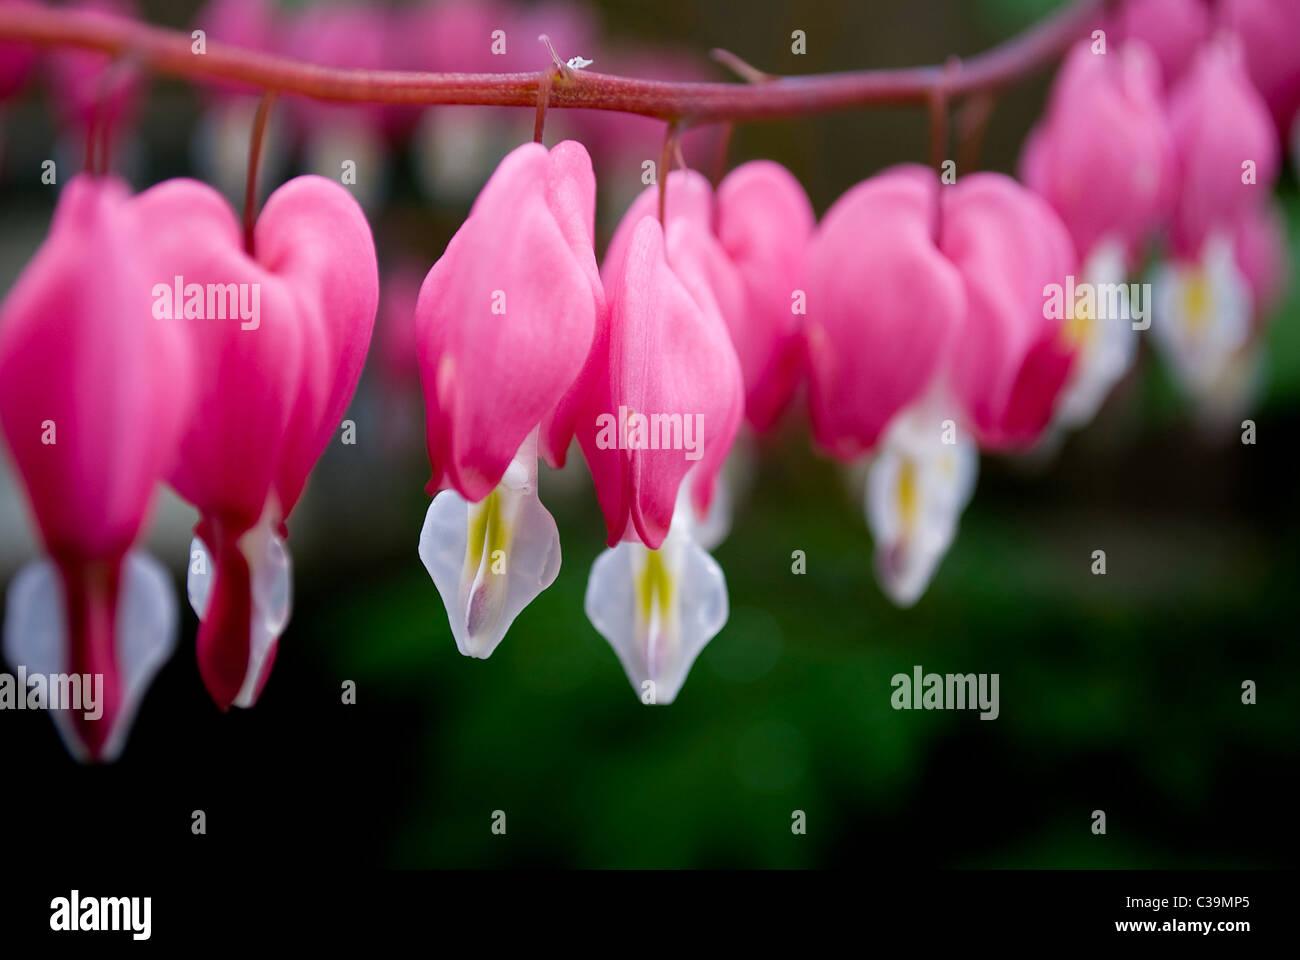 Dicentra Pink Bleeding Heart Flower Close Up Soft Focus Stock Photo